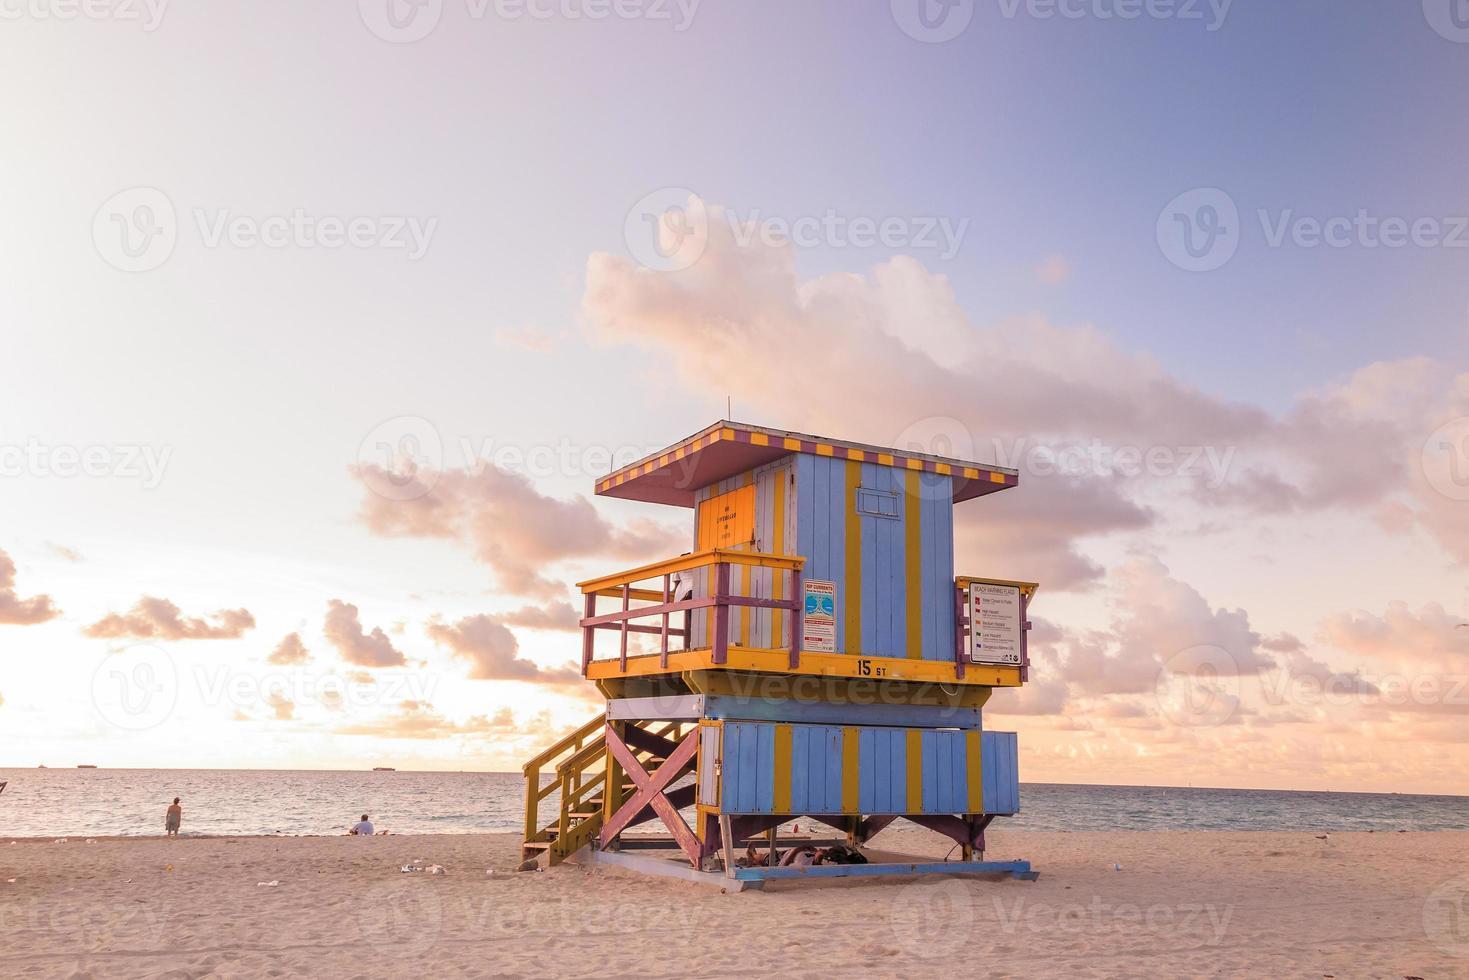 livräddartorn i södra stranden, Miami Beach, Florida foto